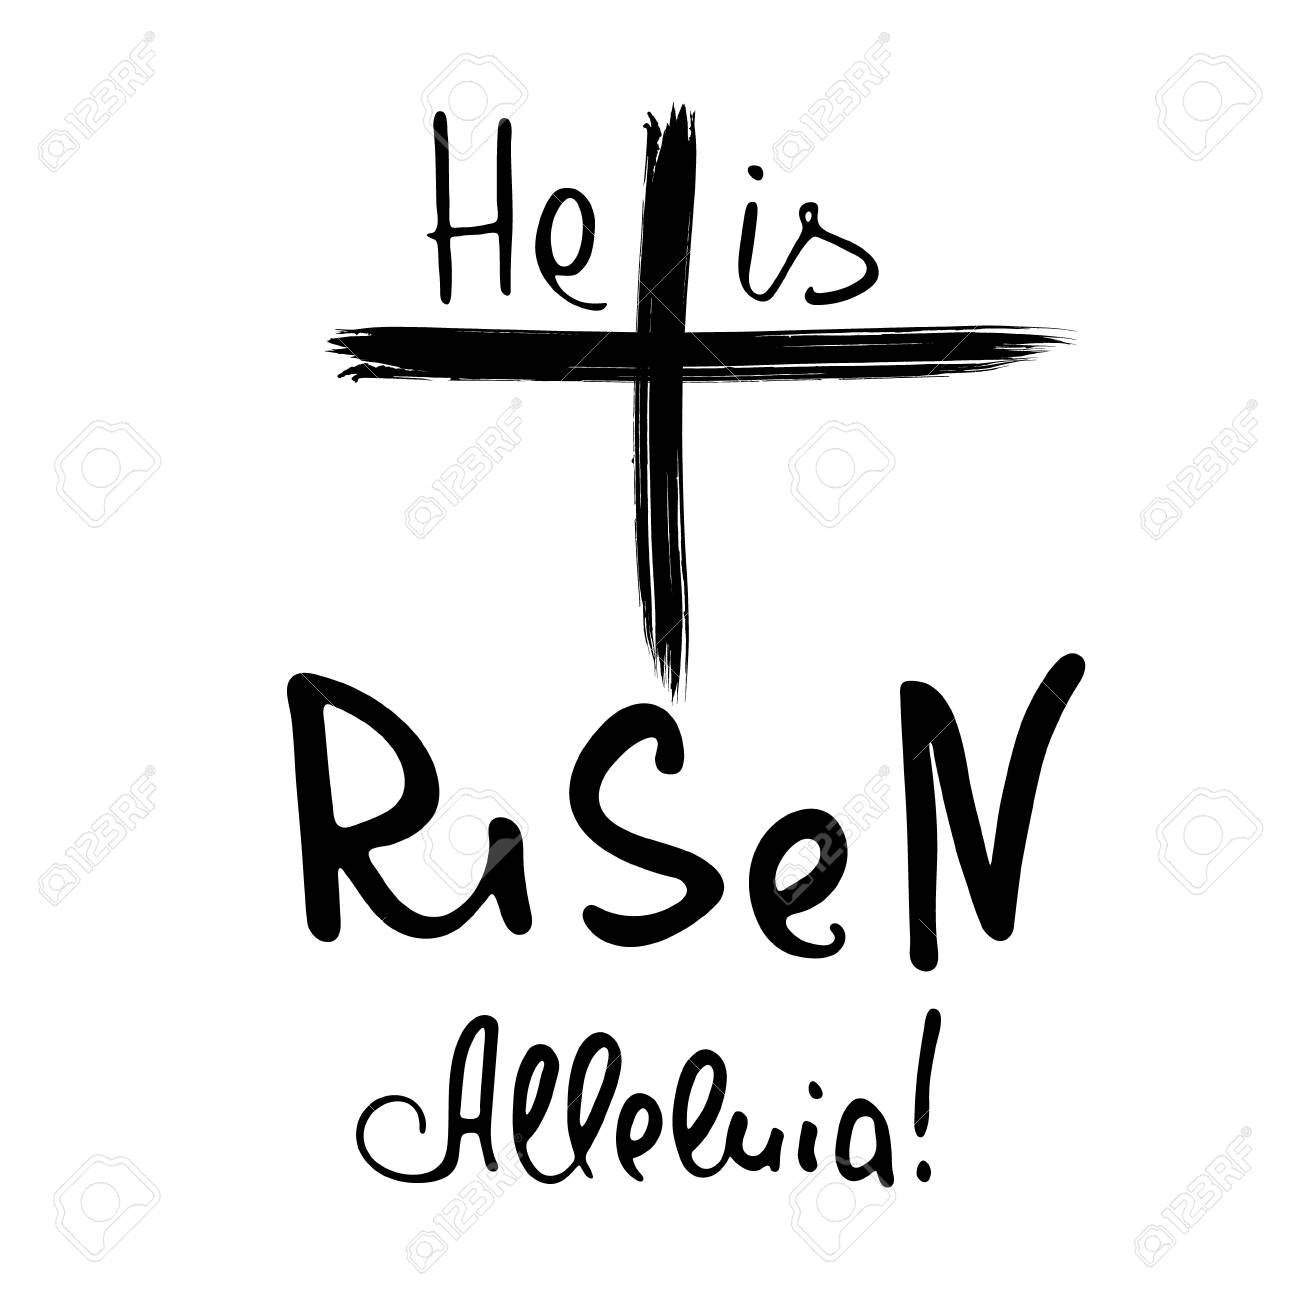 He is risen. Alleluia. Bible lettering. Brush calligraphy.